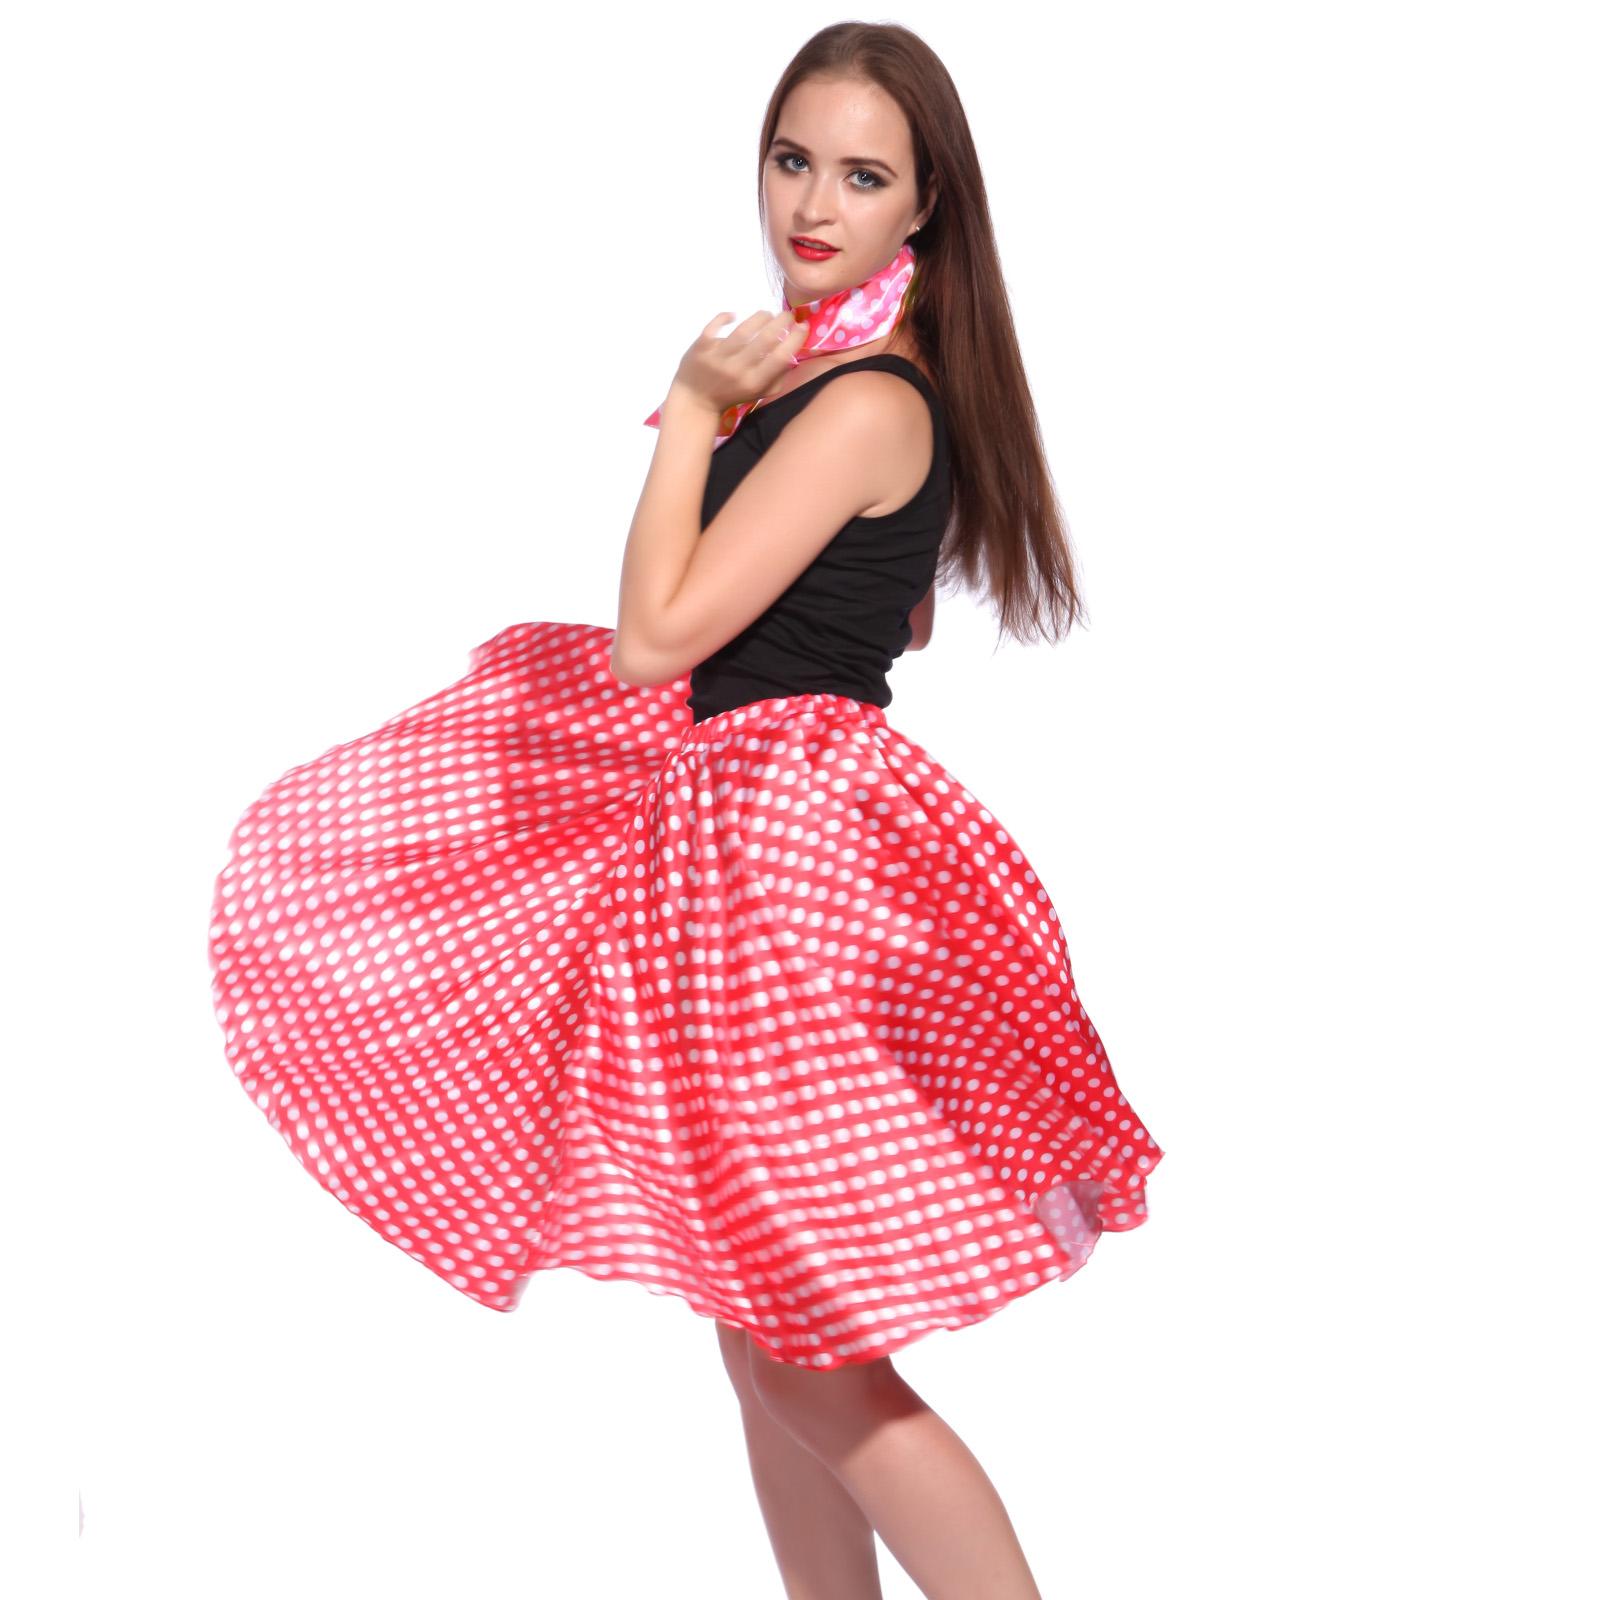 Galerry party dress ebay uk